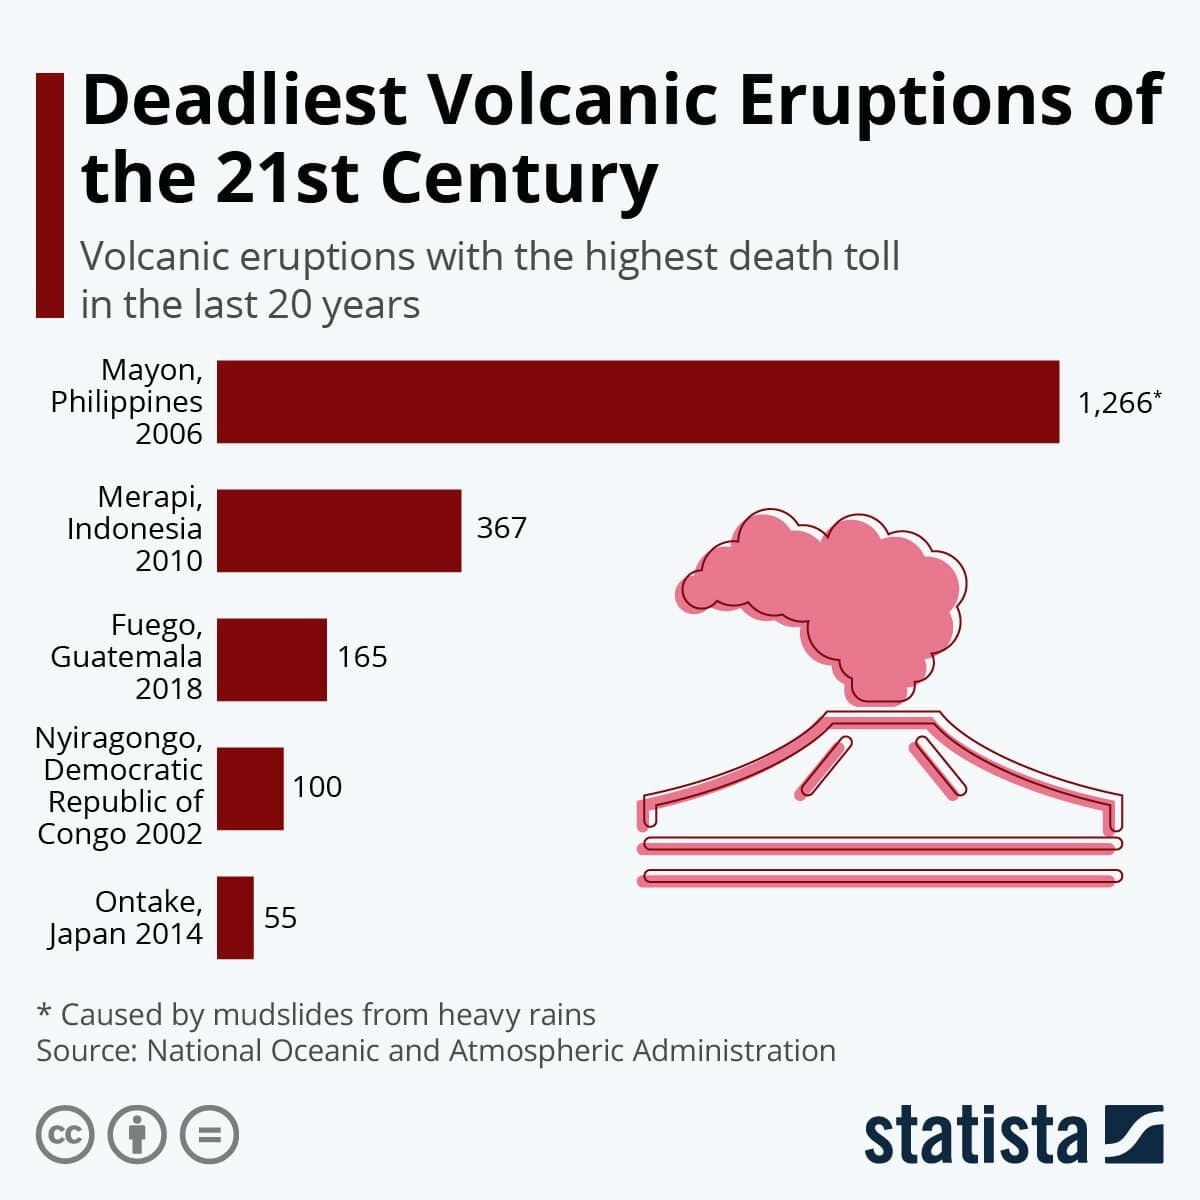 Deadliest Volcanic Eruptions of the 21st Century